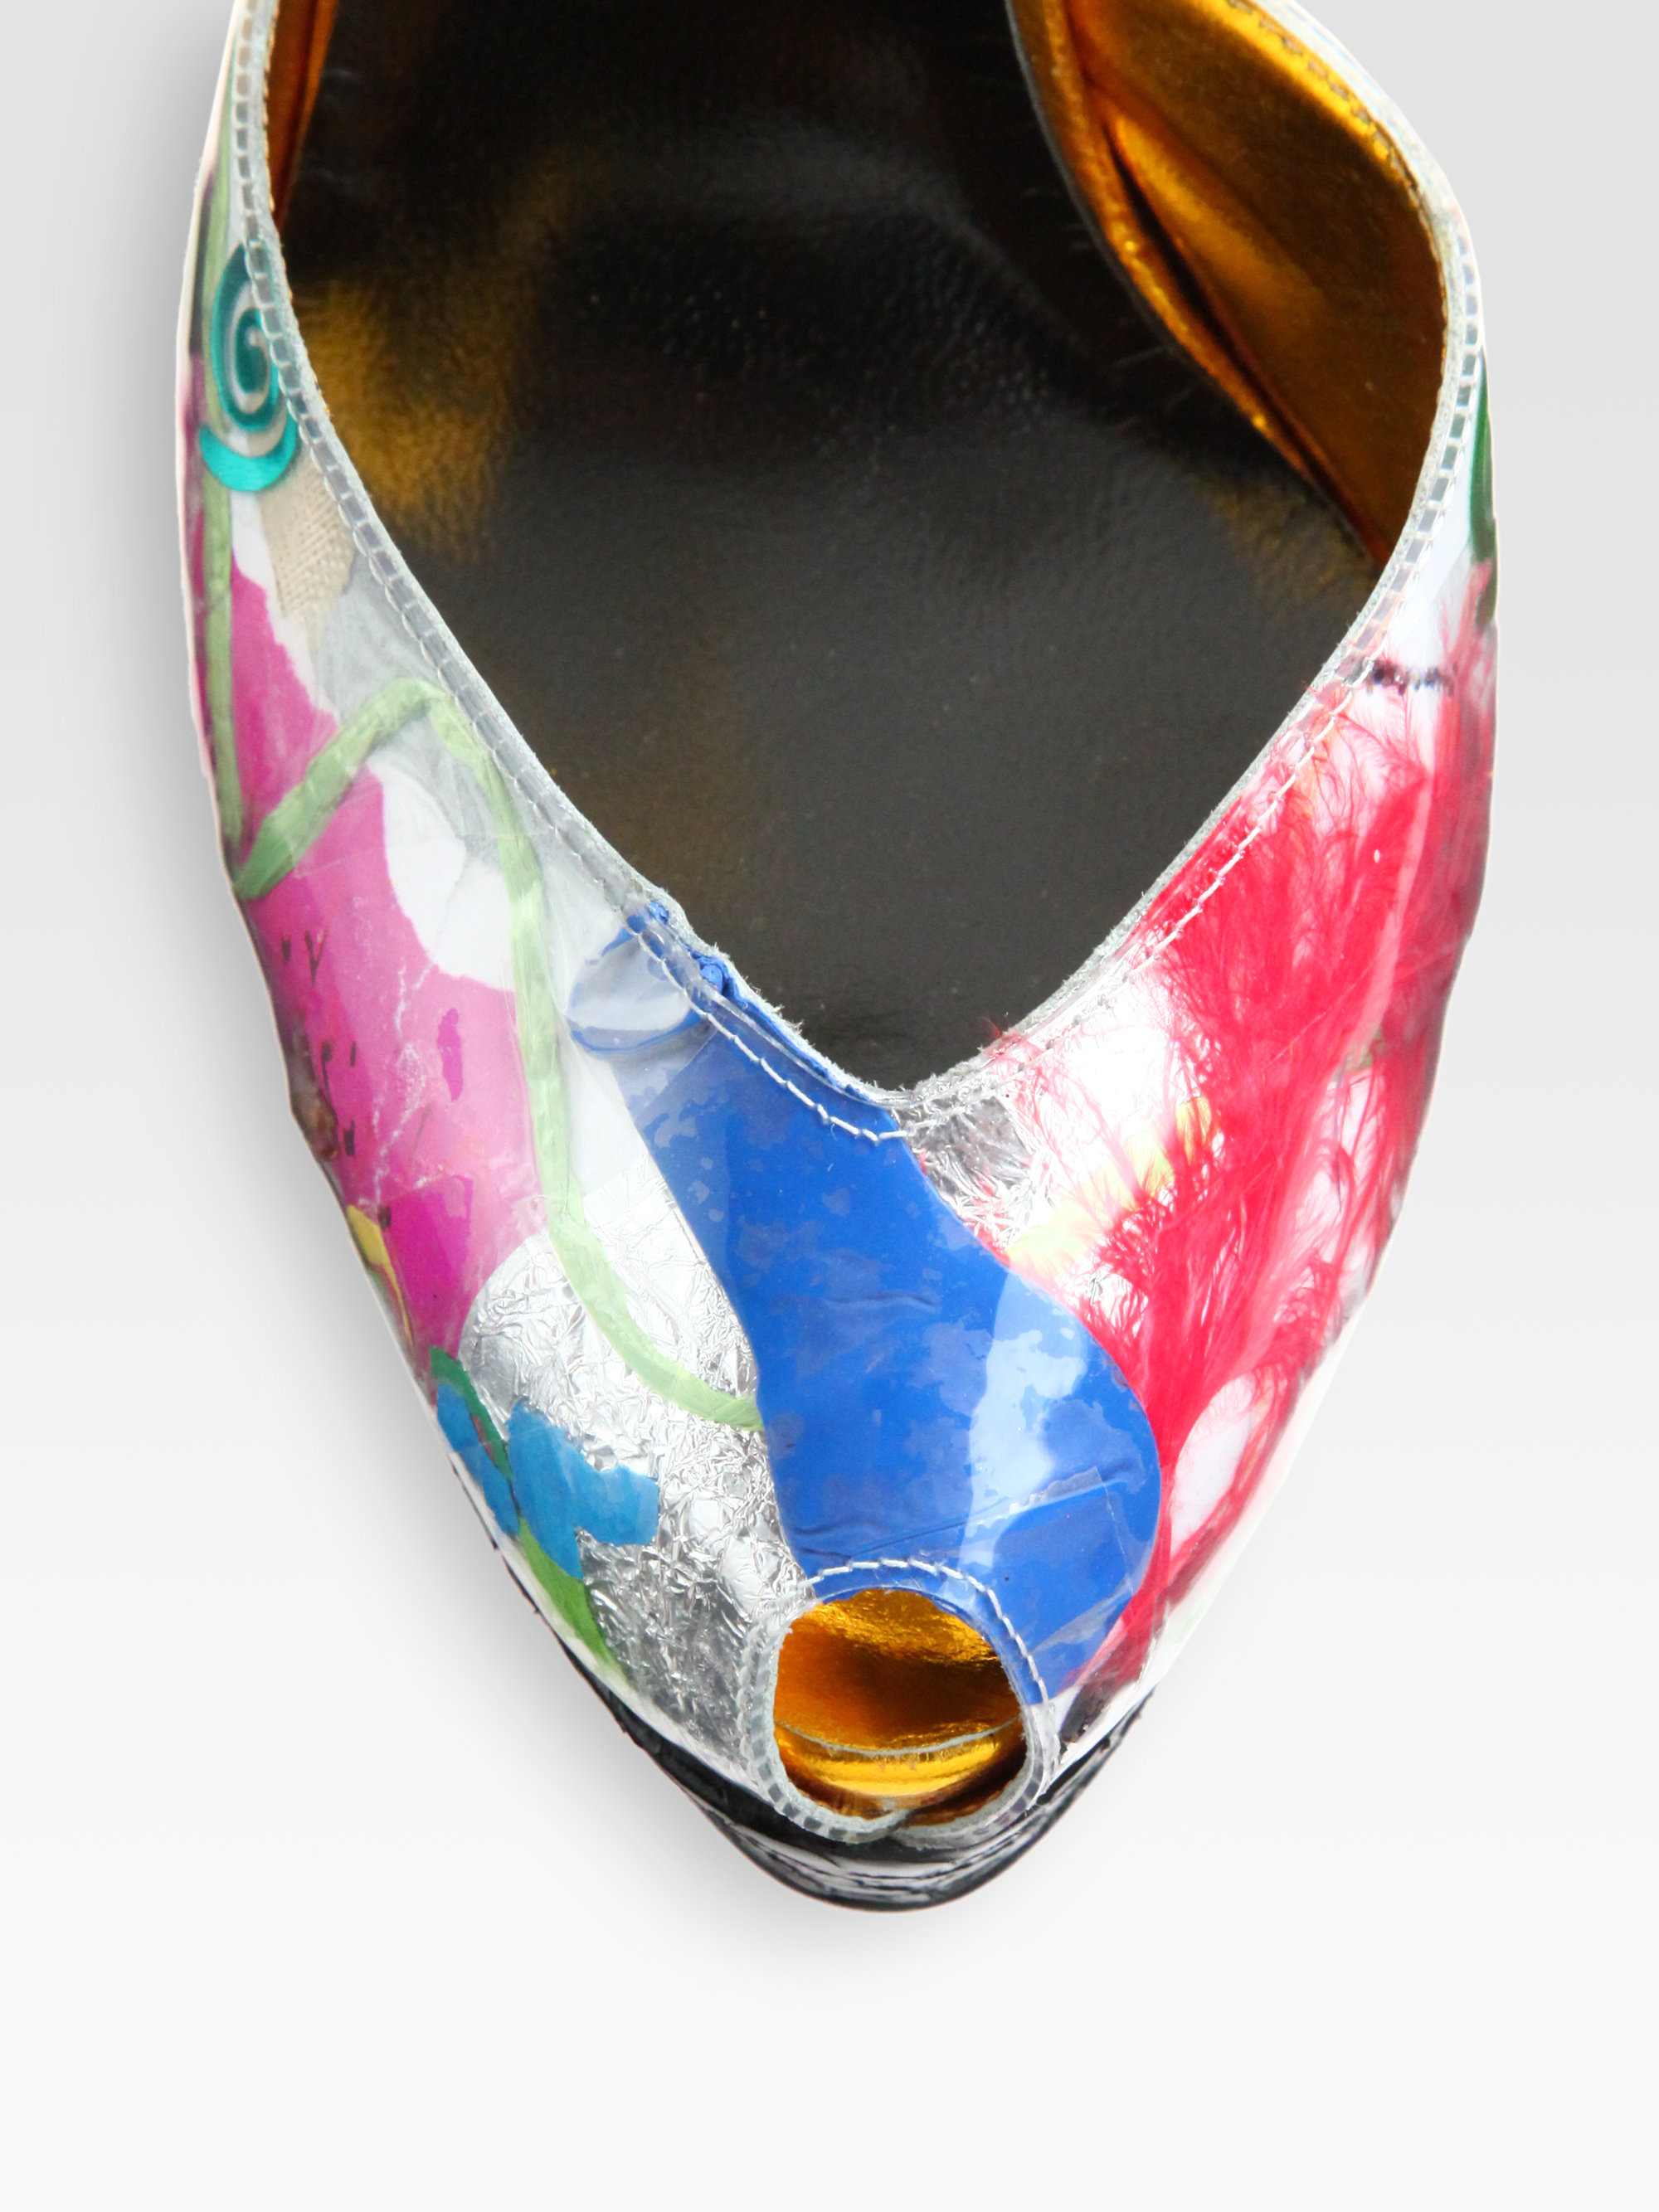 louis vuitton fake shoes - Christian louboutin No 299 Trash Patent Python Sandals in ...